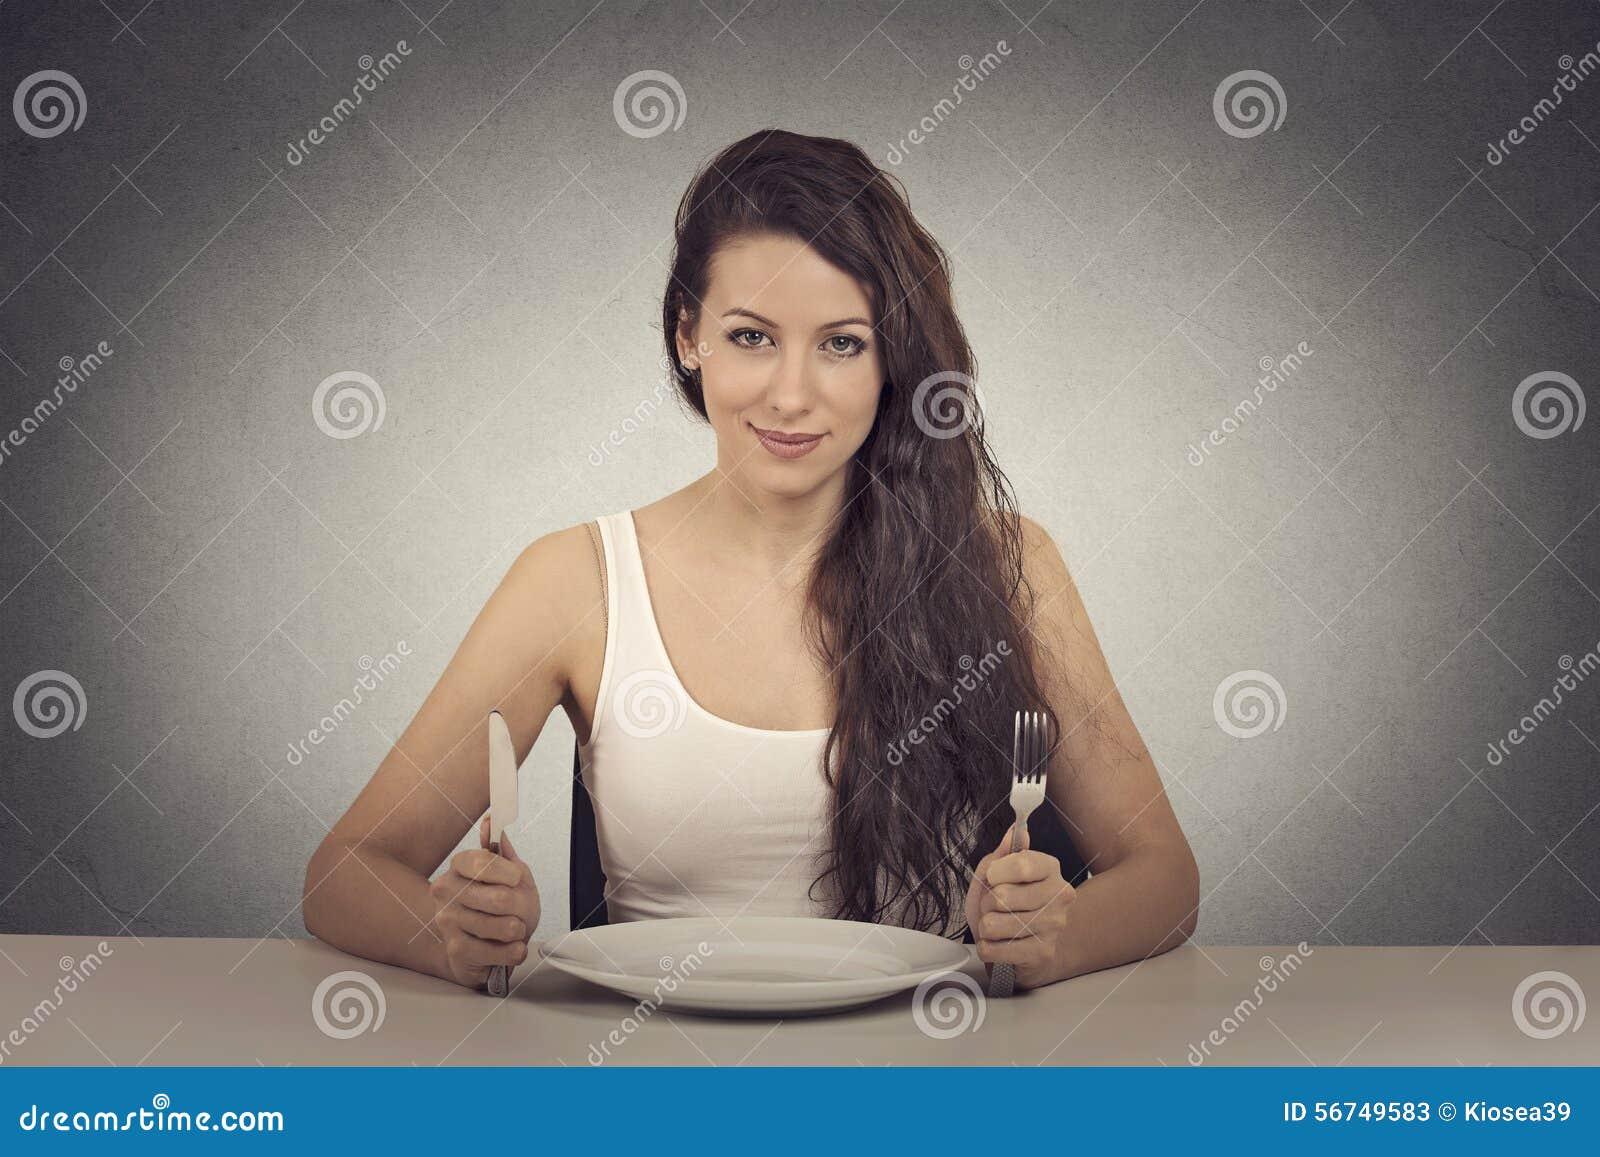 Happy dieting woman